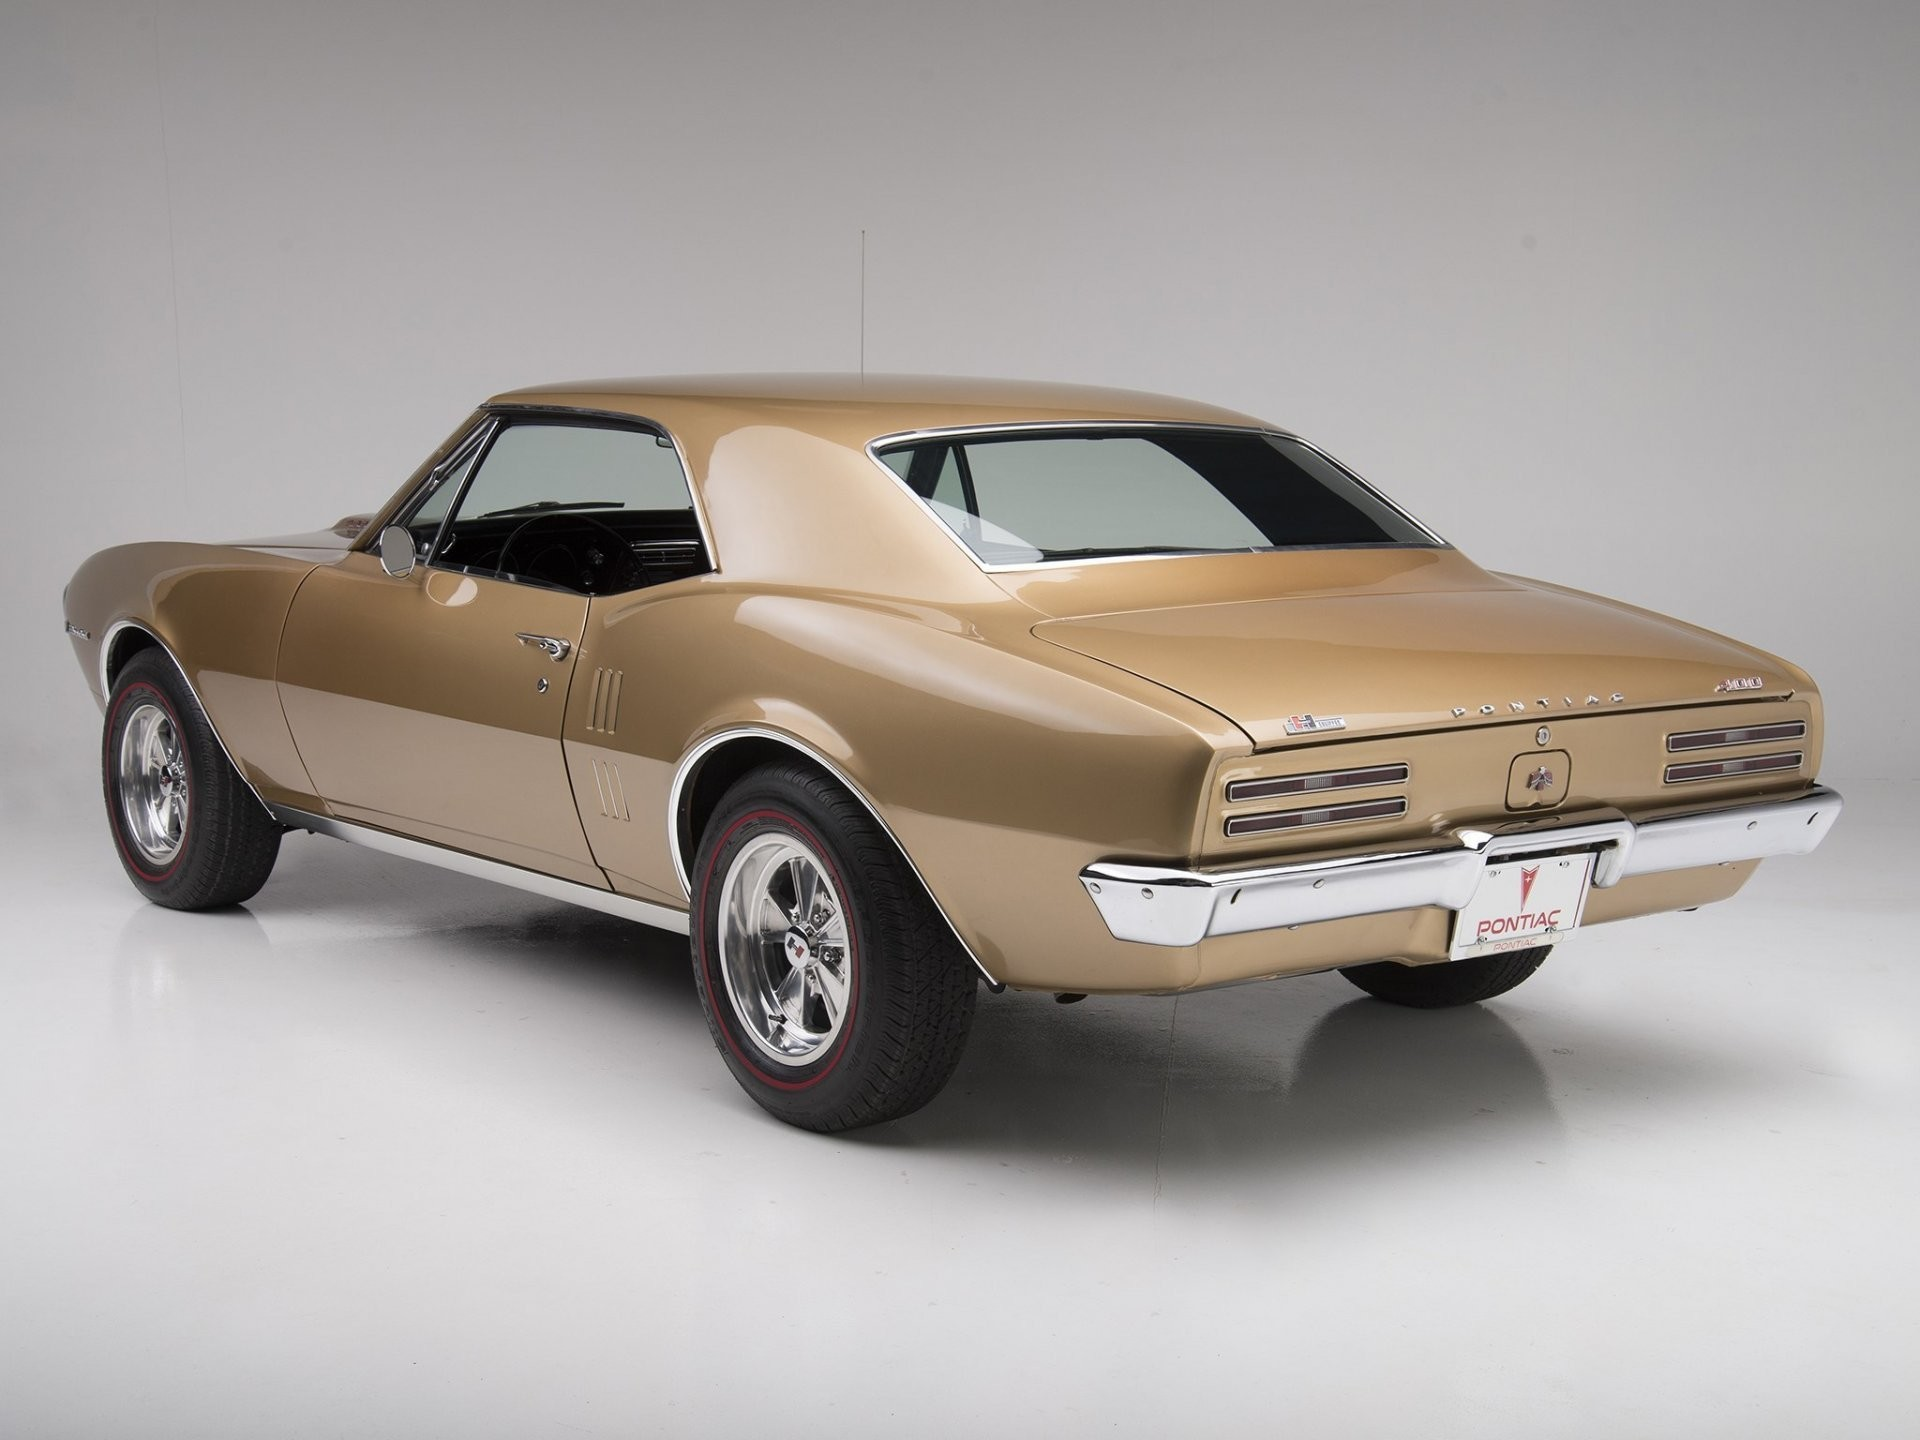 Res: 1920x1440, pontiac firebird 1967 muscle car rear